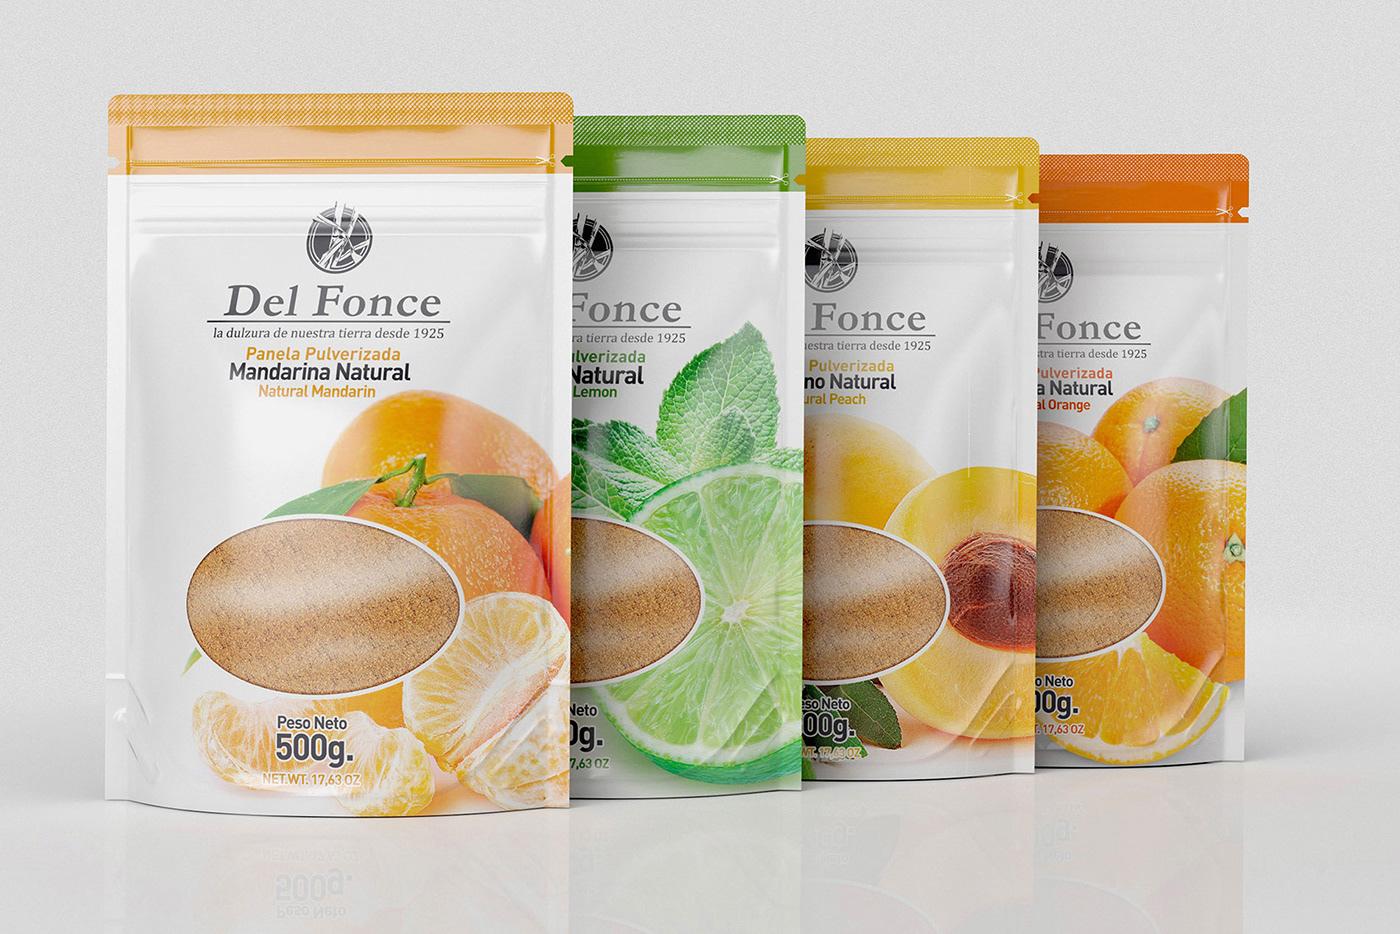 Cane sugar colombia fruits lemon peach orange brand logo bag david espinosa